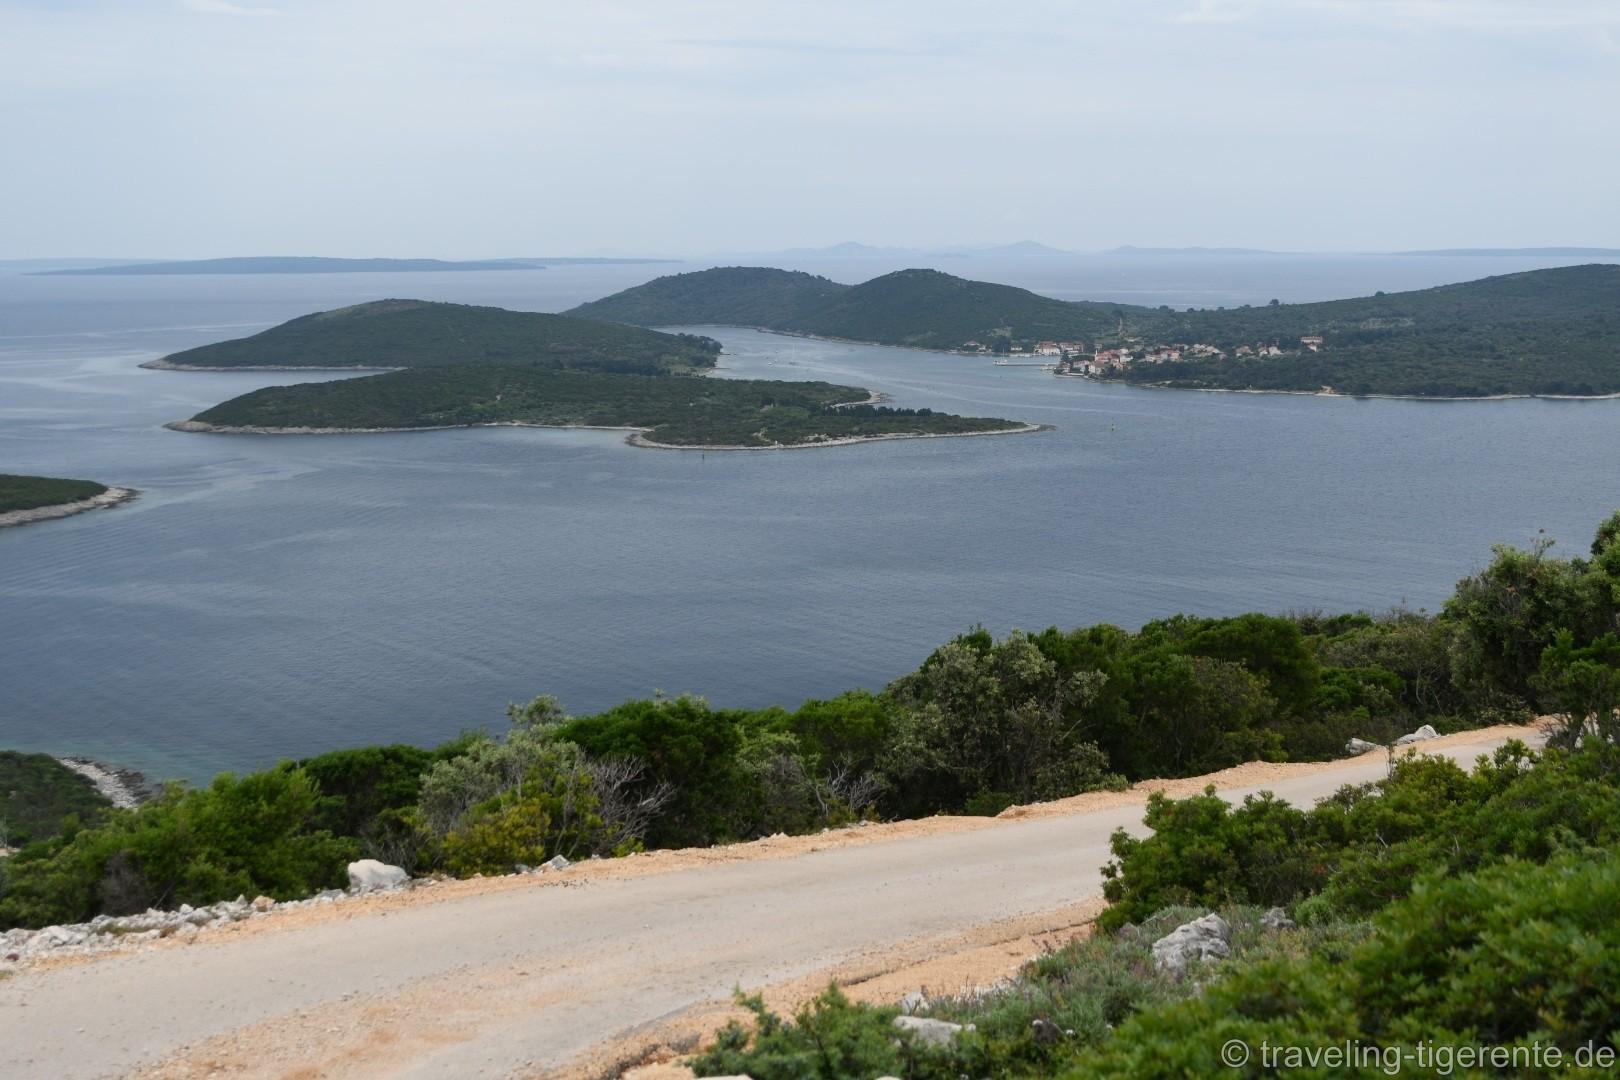 Blick vom Südzipfel Lošinjs zur Insel Ilvoik.